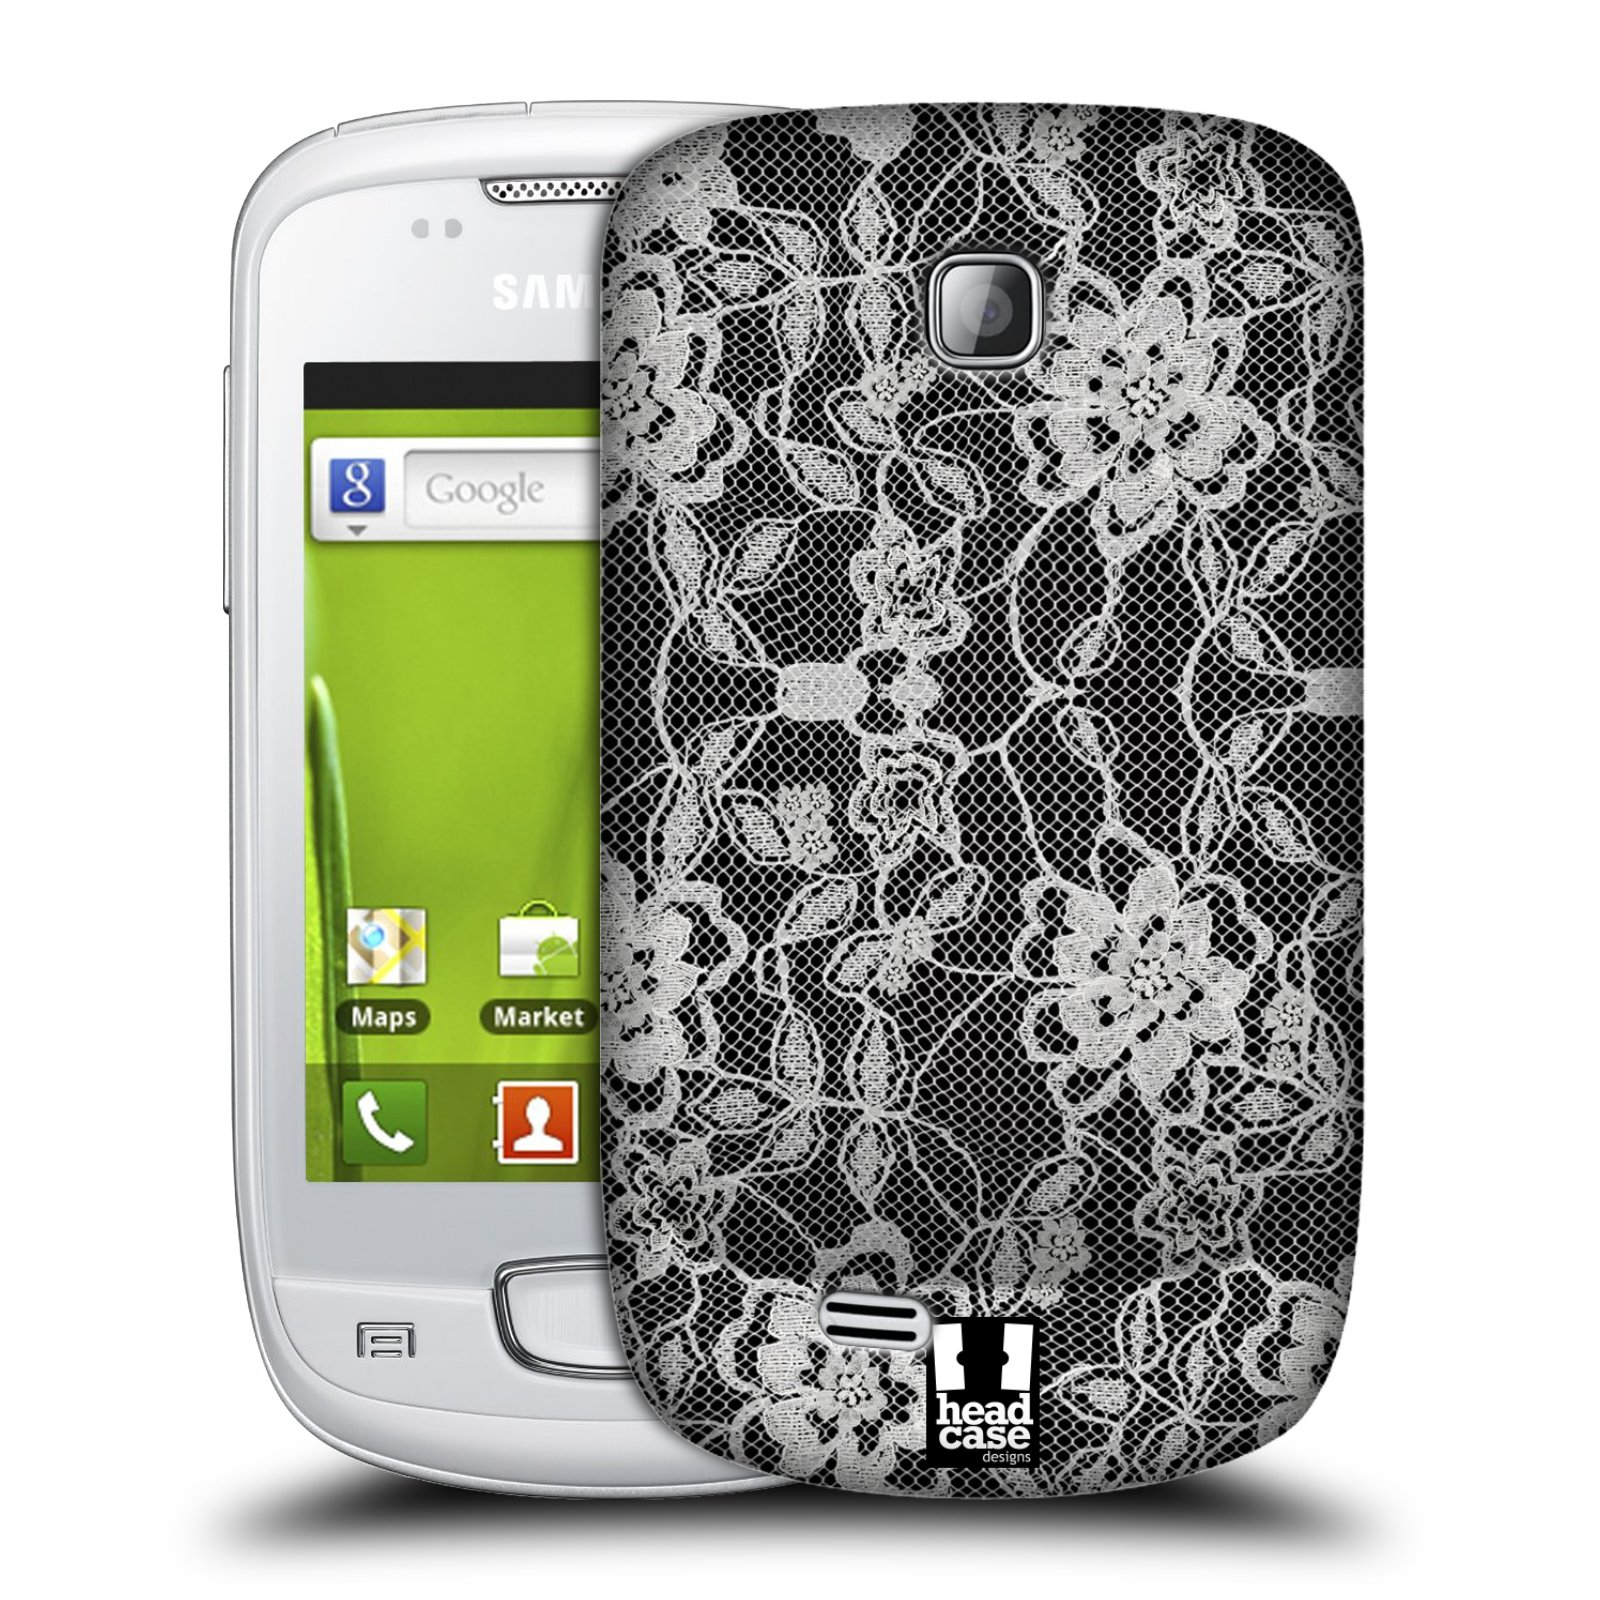 Plastové pouzdro na mobil Samsung Galaxy Mini HEAD CASE FLOWERY KRAJKA (Kryt či obal na mobilní telefon Samsung Galaxy Mini GT-S5570 / GT-S5570i)